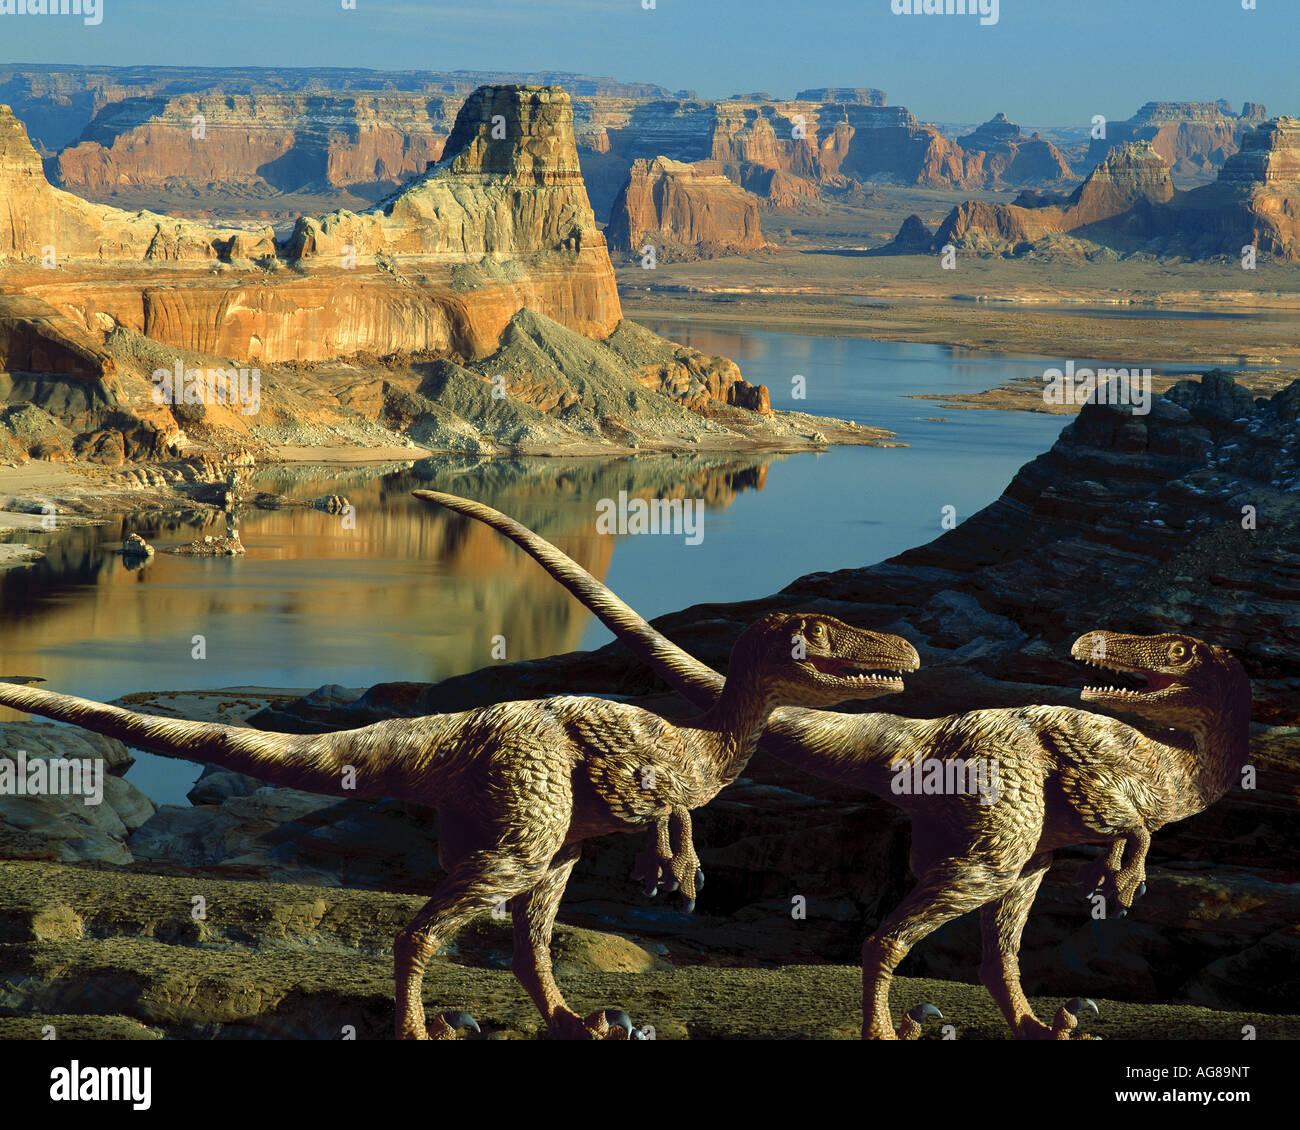 Velociraptor dinosaurs in the American Southwest - Stock Image